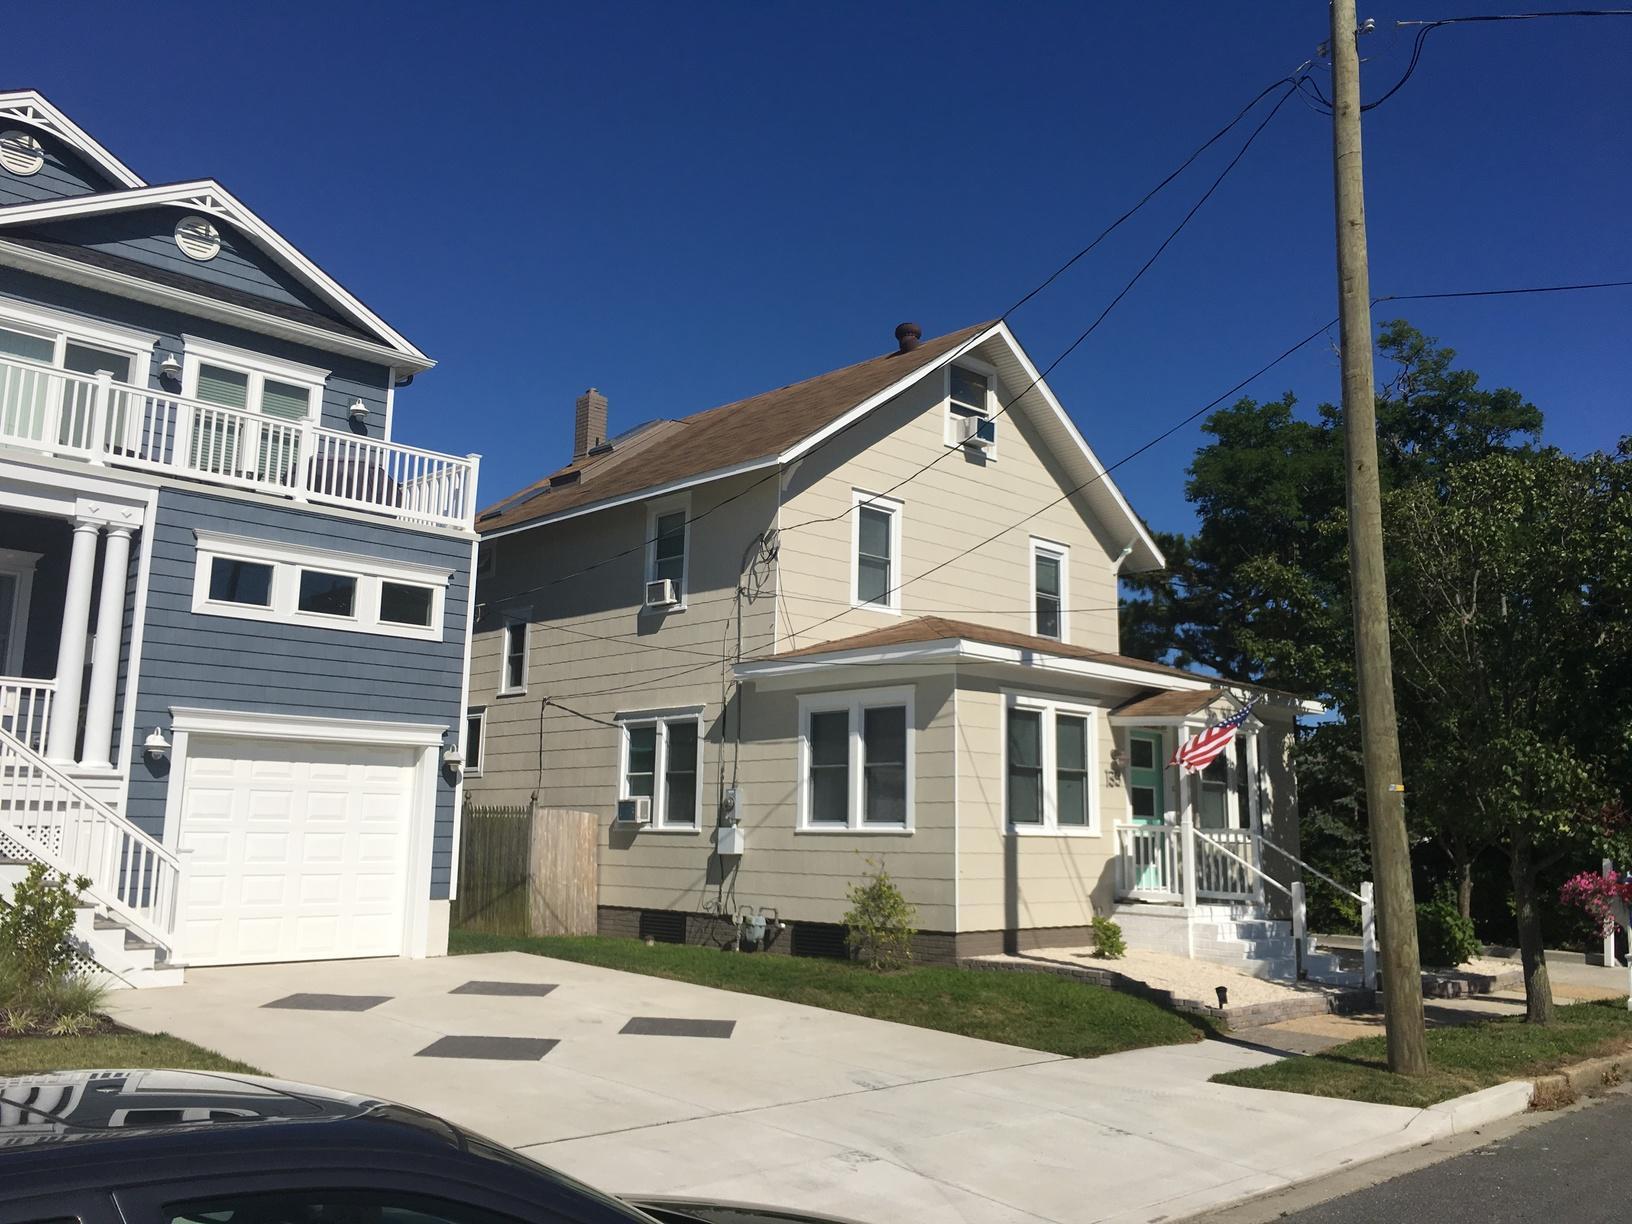 Mansard Brown Standing Seam Metal Roof Installation on Jersey Shore Home in Brigantine, NJ - Before Photo